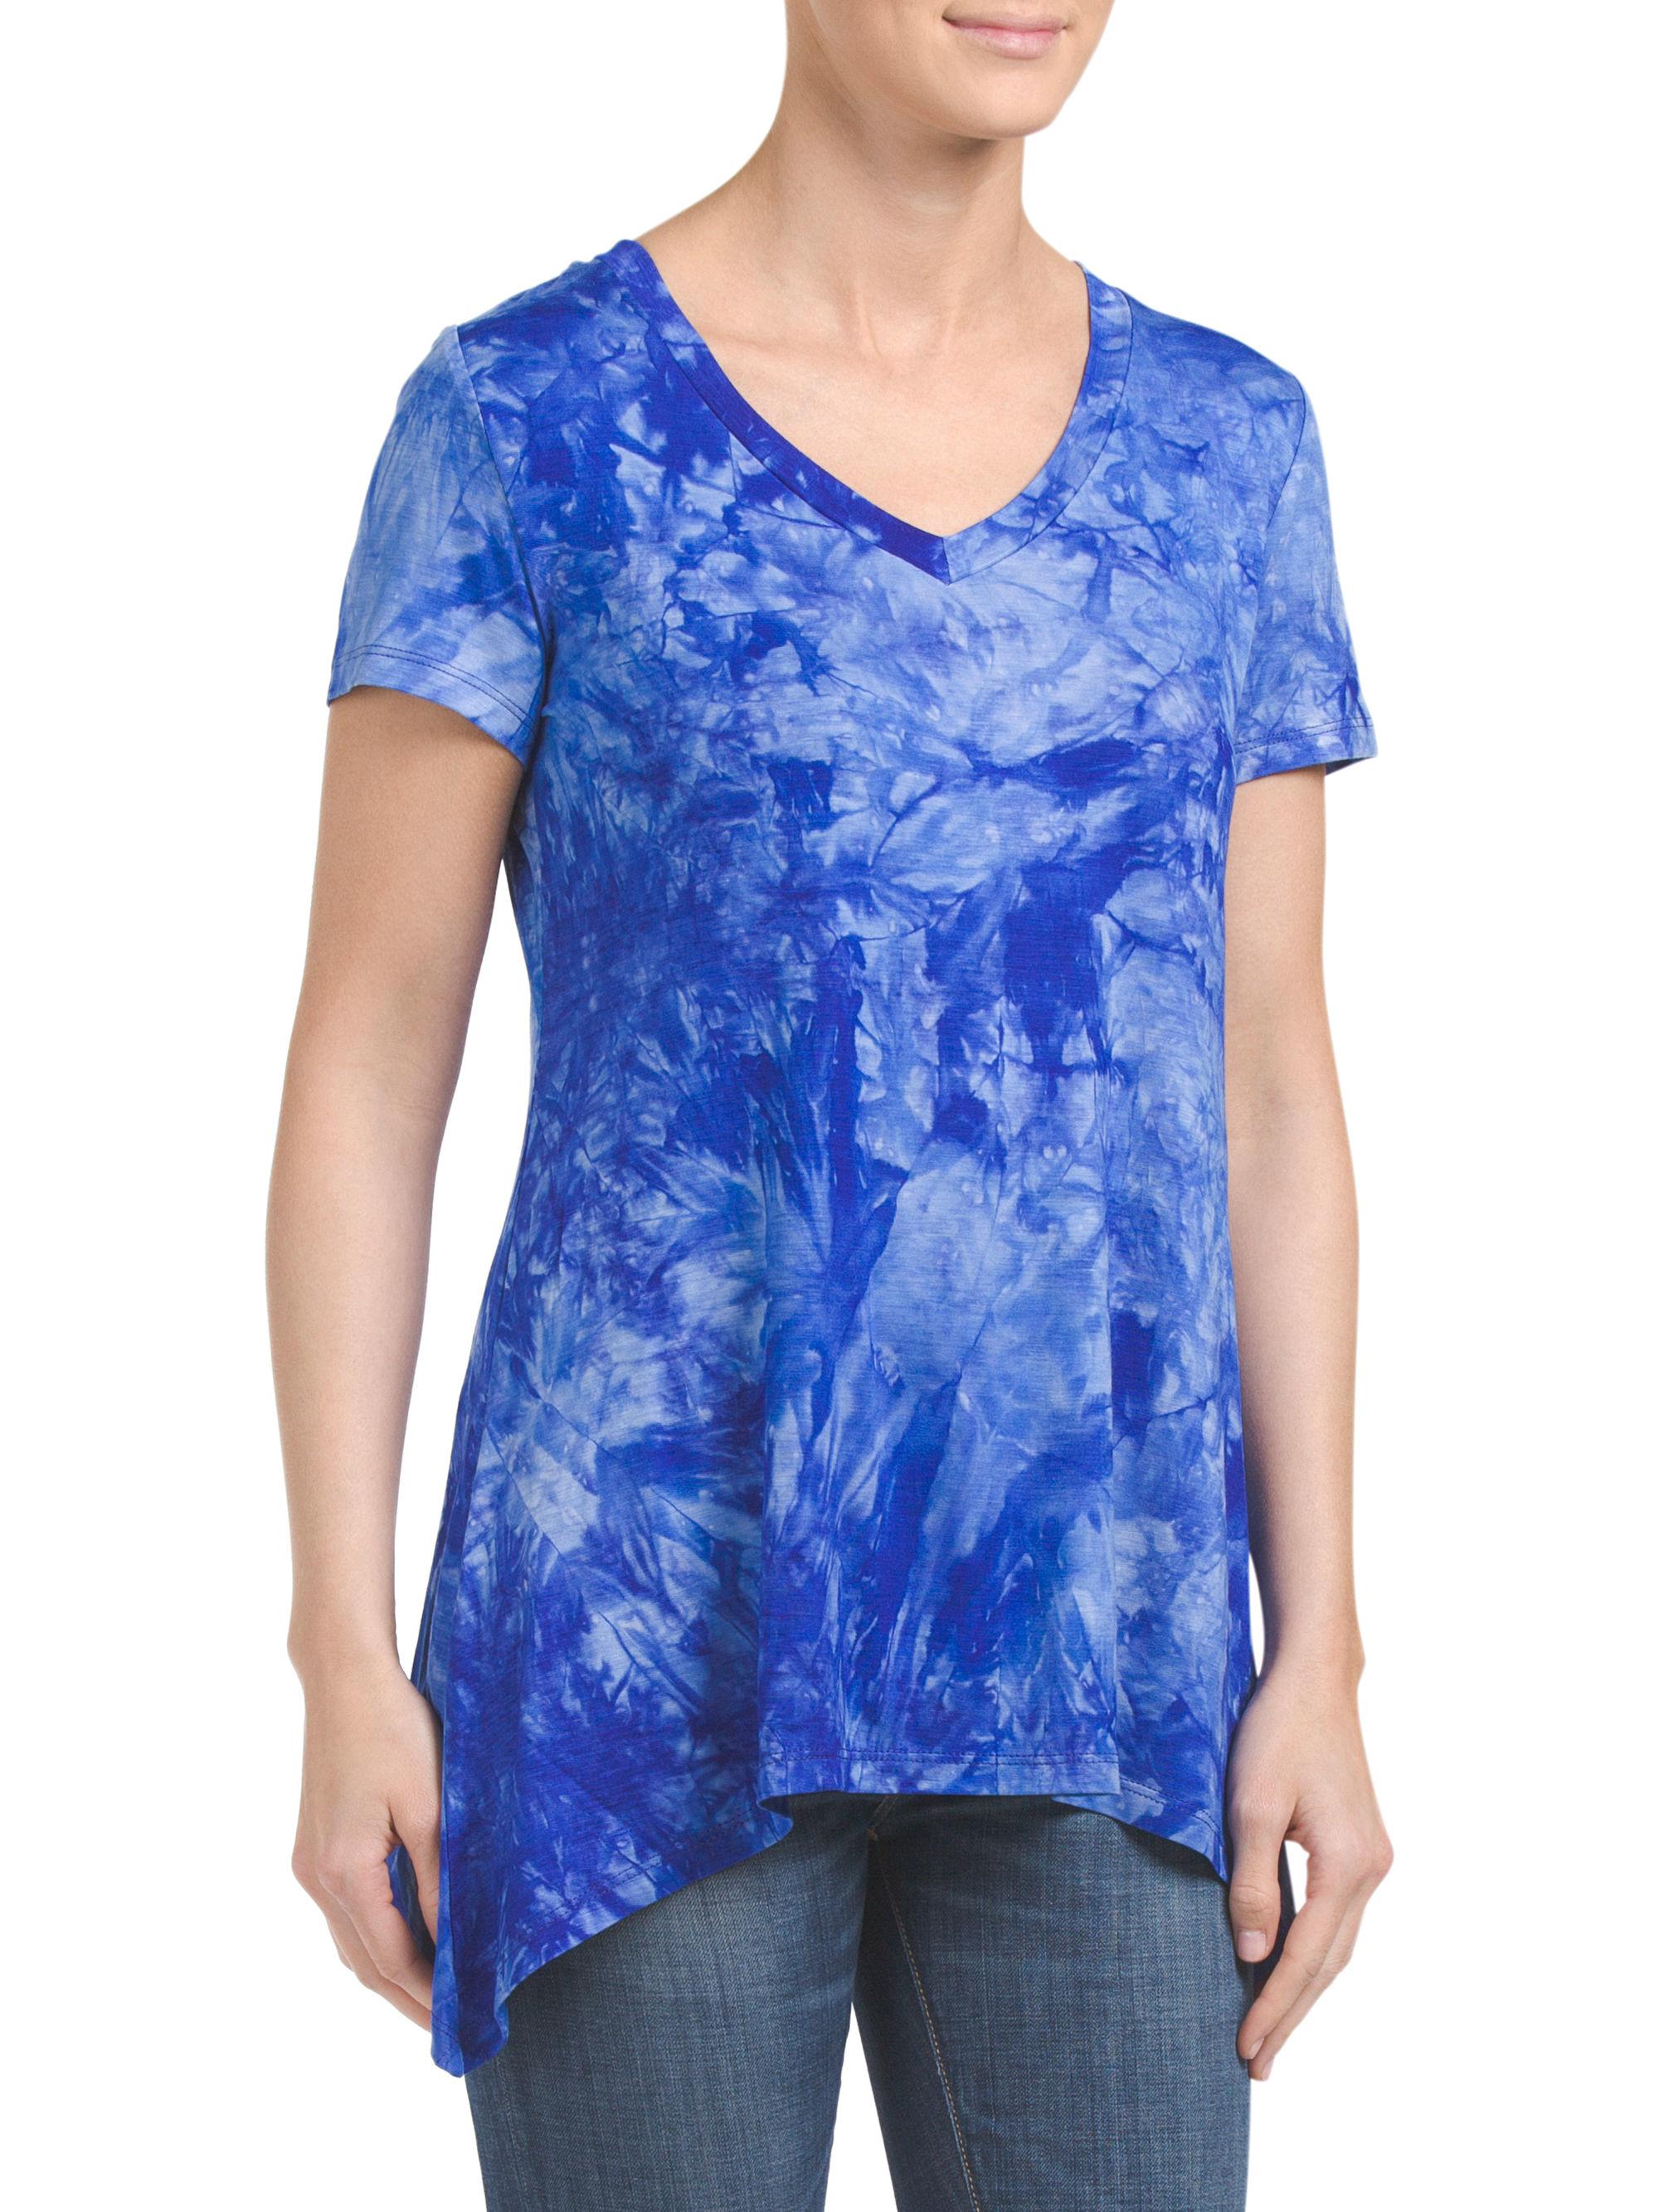 Tj maxx short sleeve shark bite dyed top in blue lyst for Tj maxx t shirts